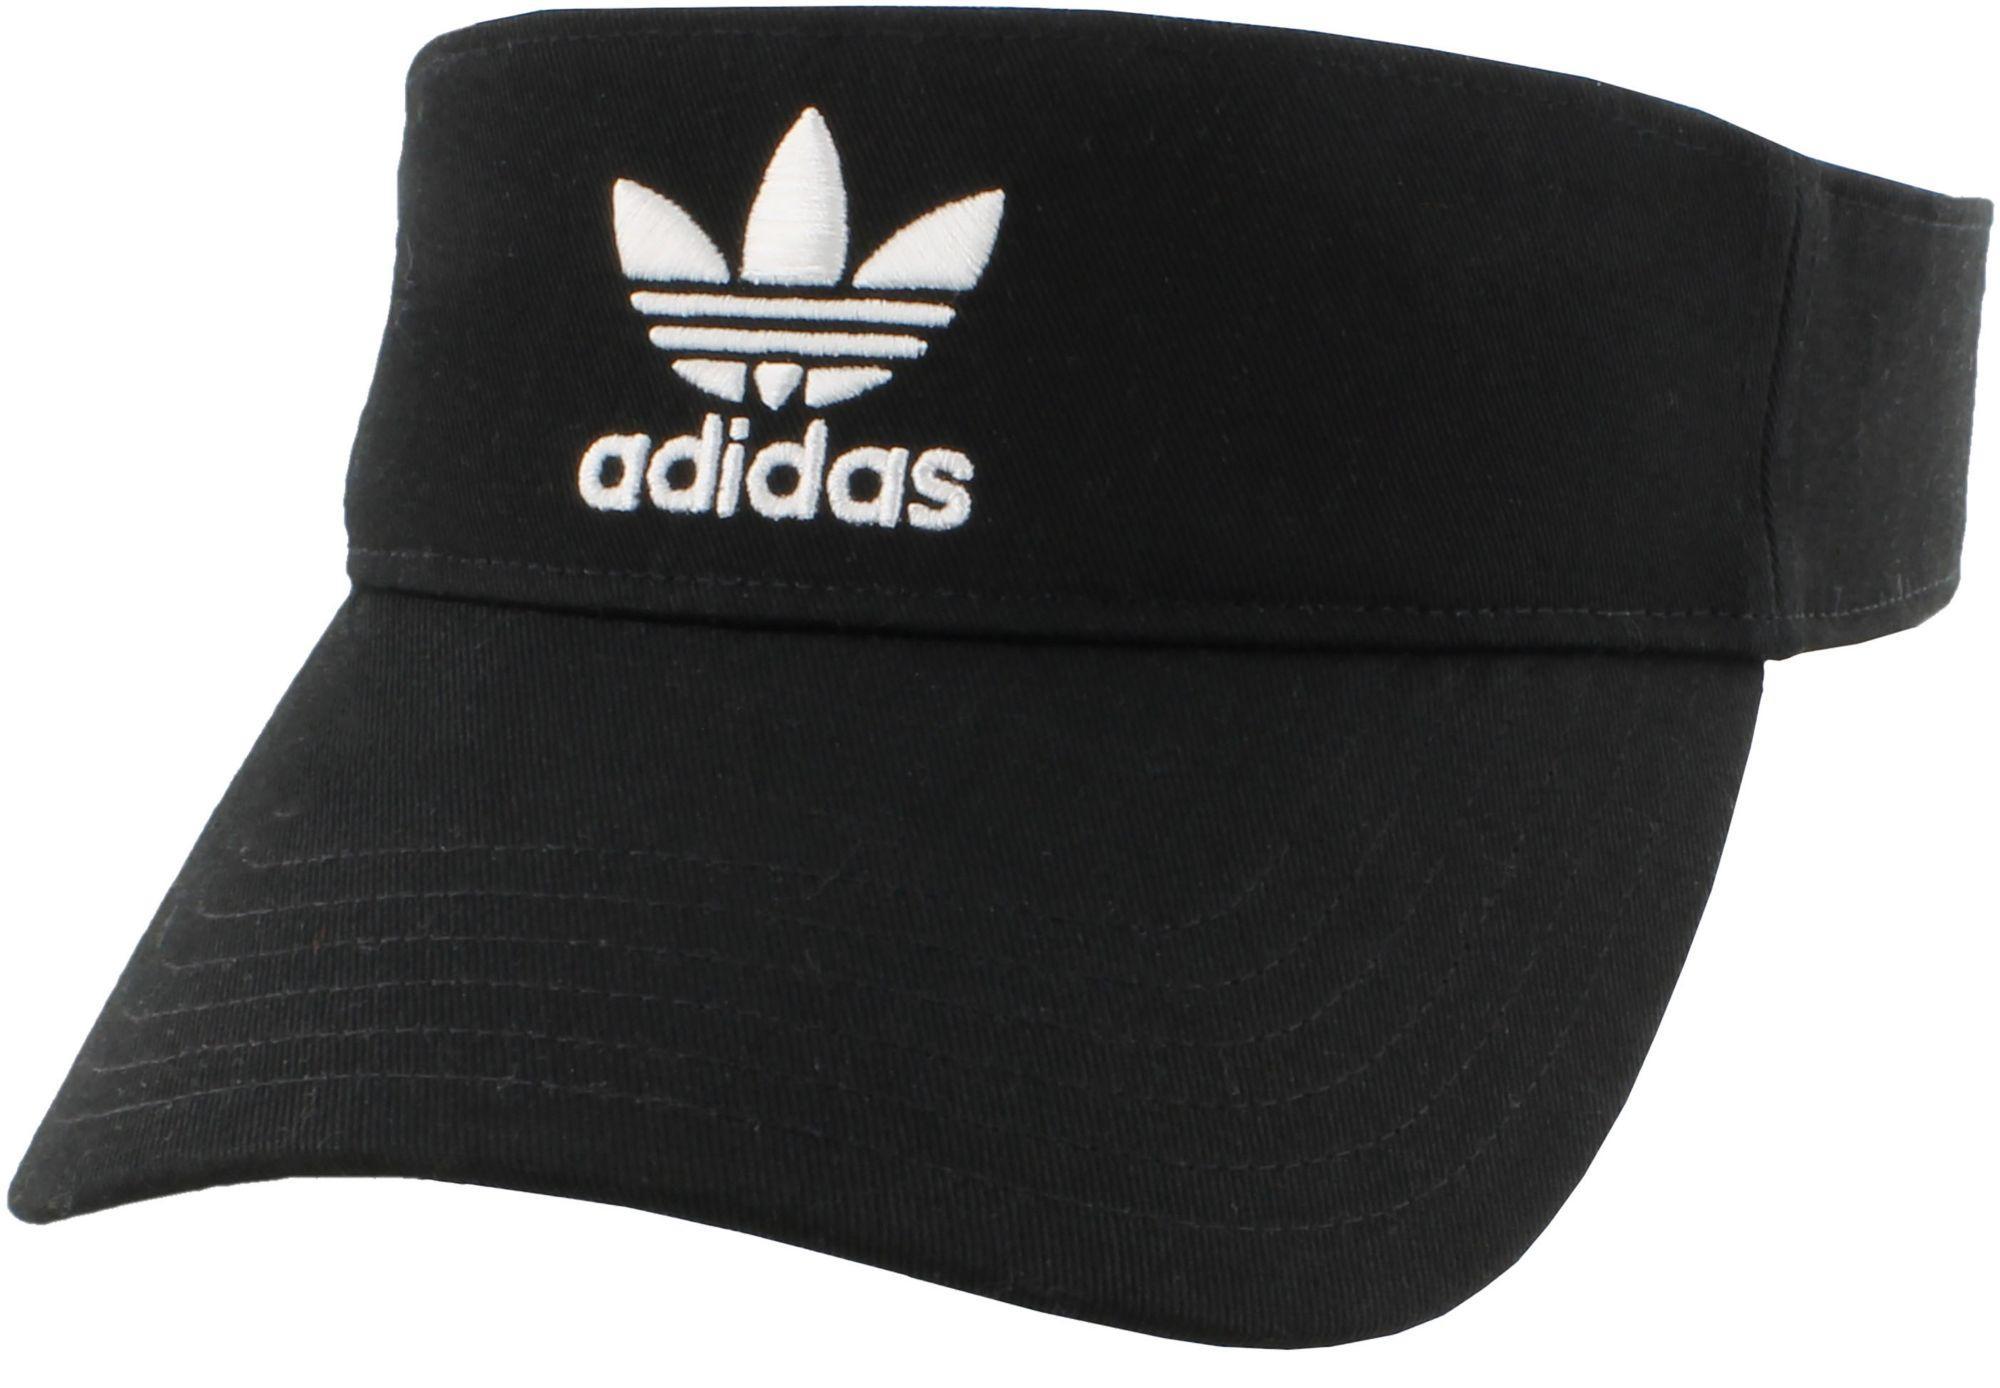 e69b1bb4709 Adidas - Black Originals Relaxed Modern Visor for Men - Lyst. View  fullscreen